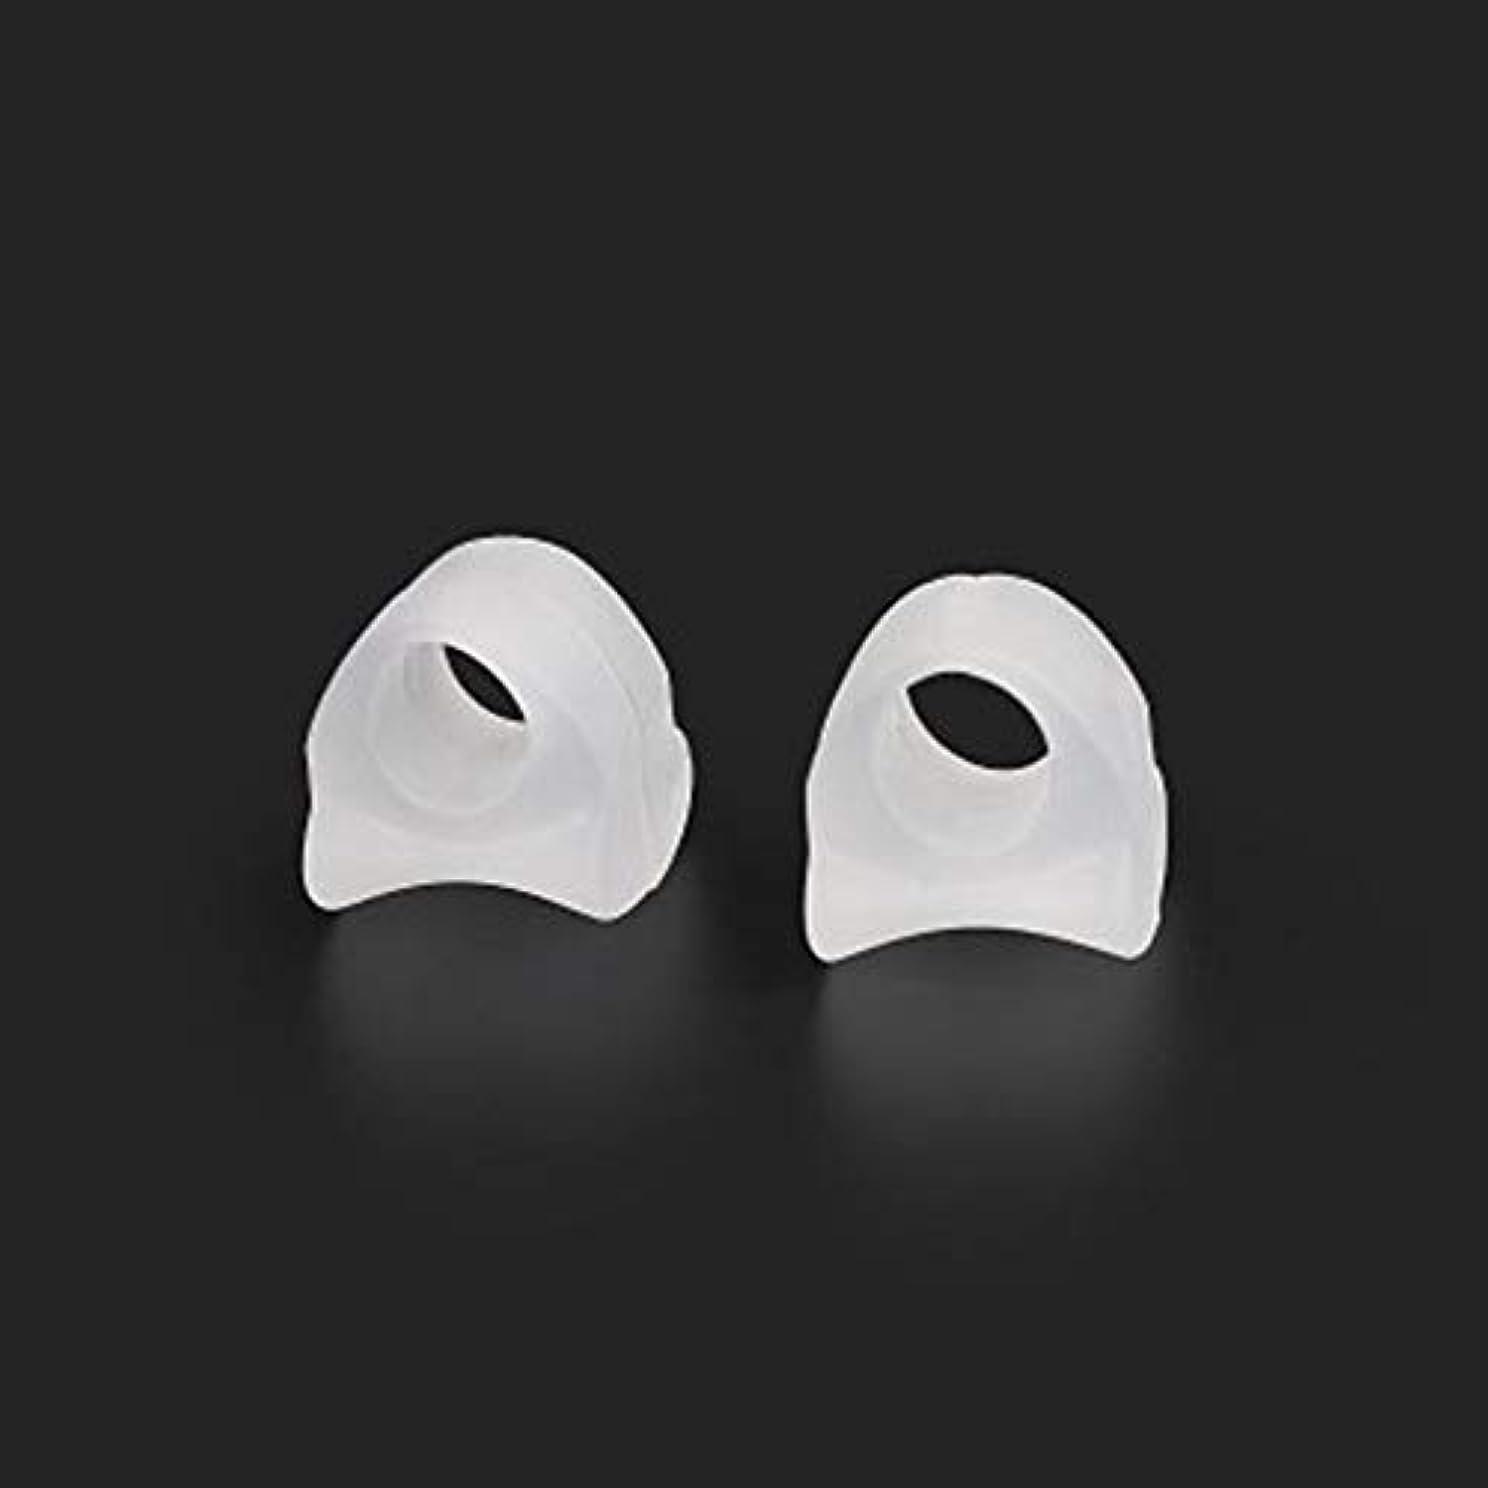 AAcreatspace Ring Shape Gel Toe Separator Toe Bunion Hallux Valgus Toe Stretchers for Men and Womenすぐに痛みを軽減するイージーウェア